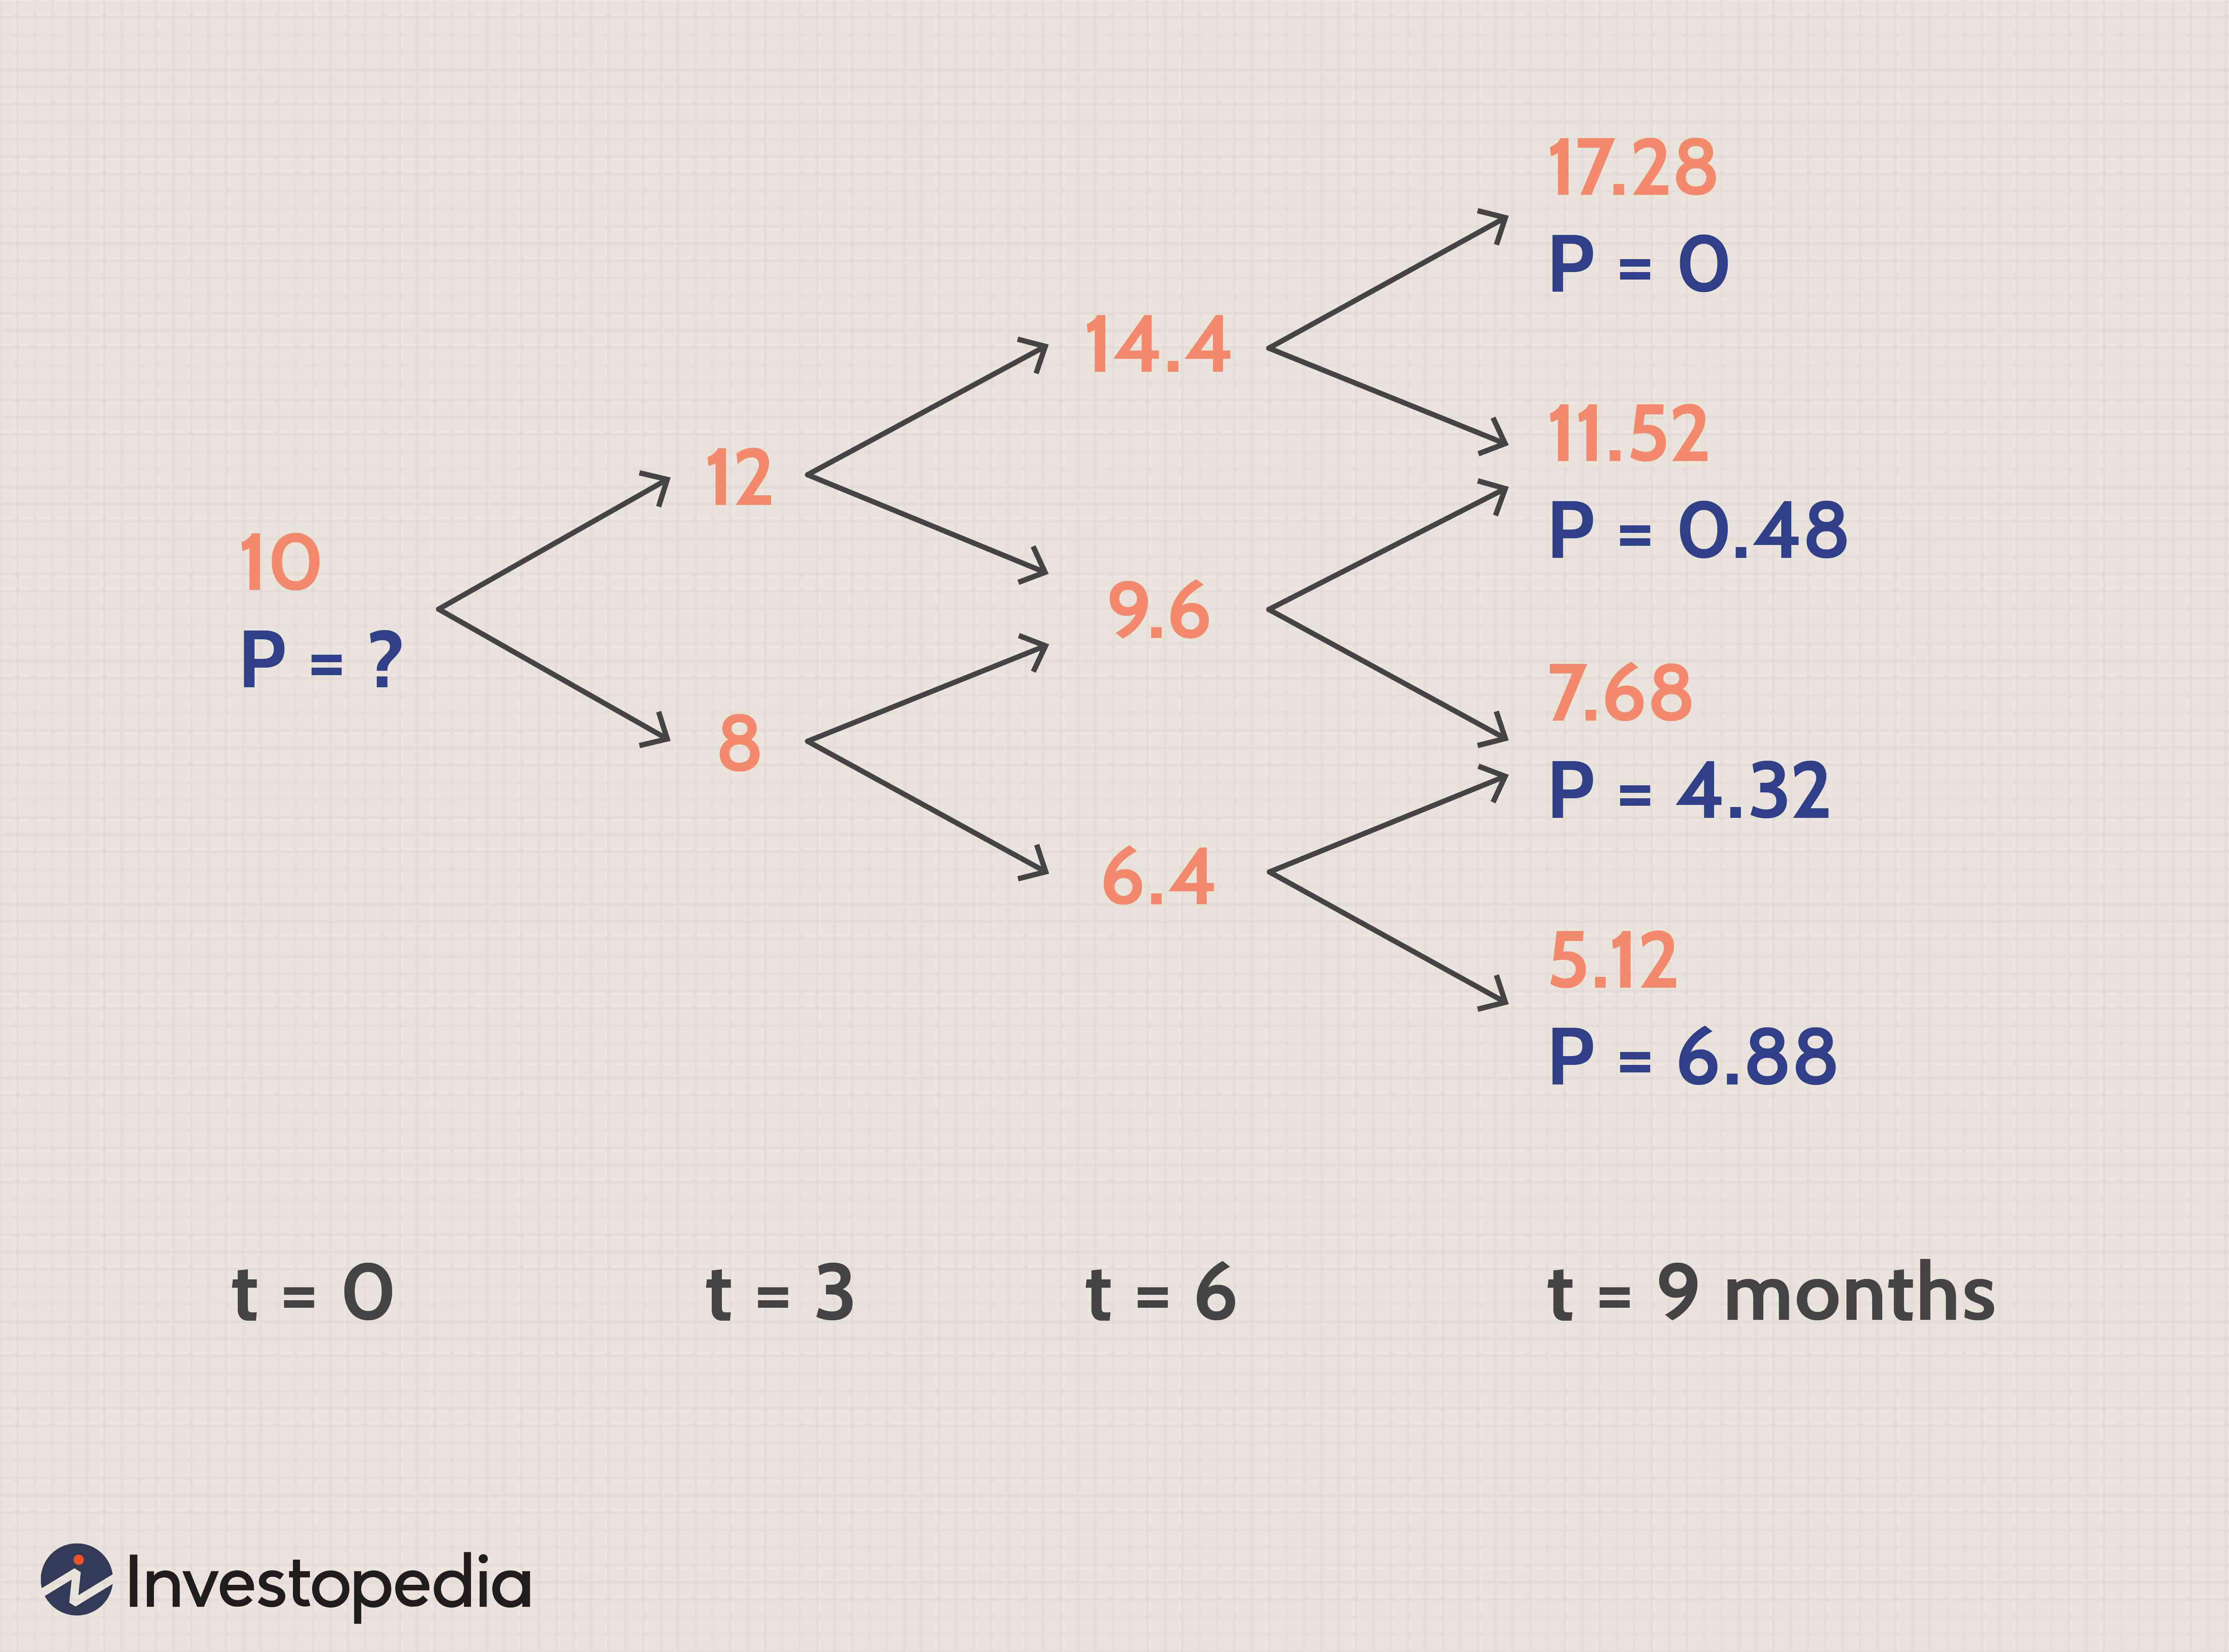 Investopedia single index model 1: A